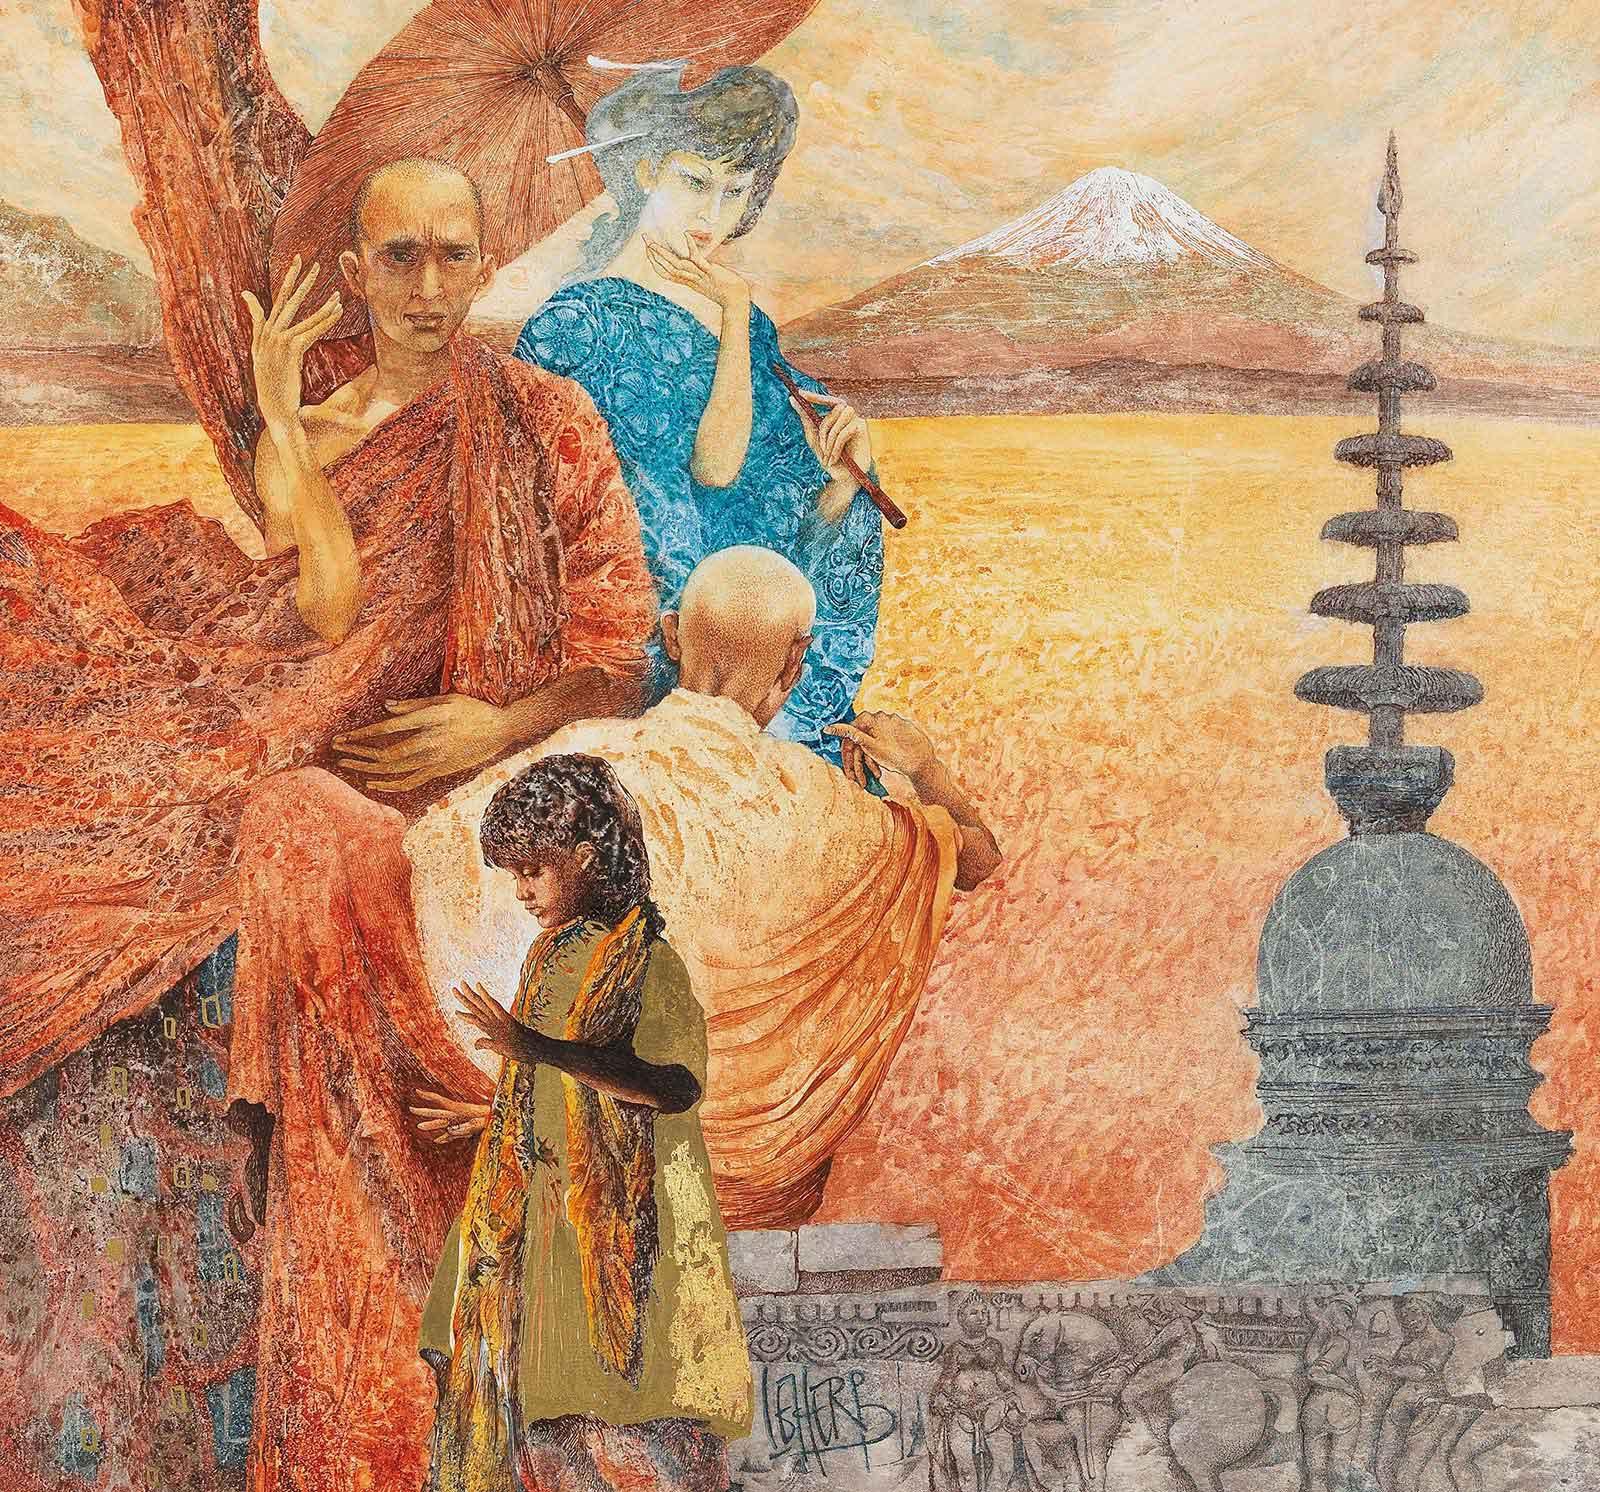 Helmut Leherb: Asien | ARGUS Art Asset Austria, Wien